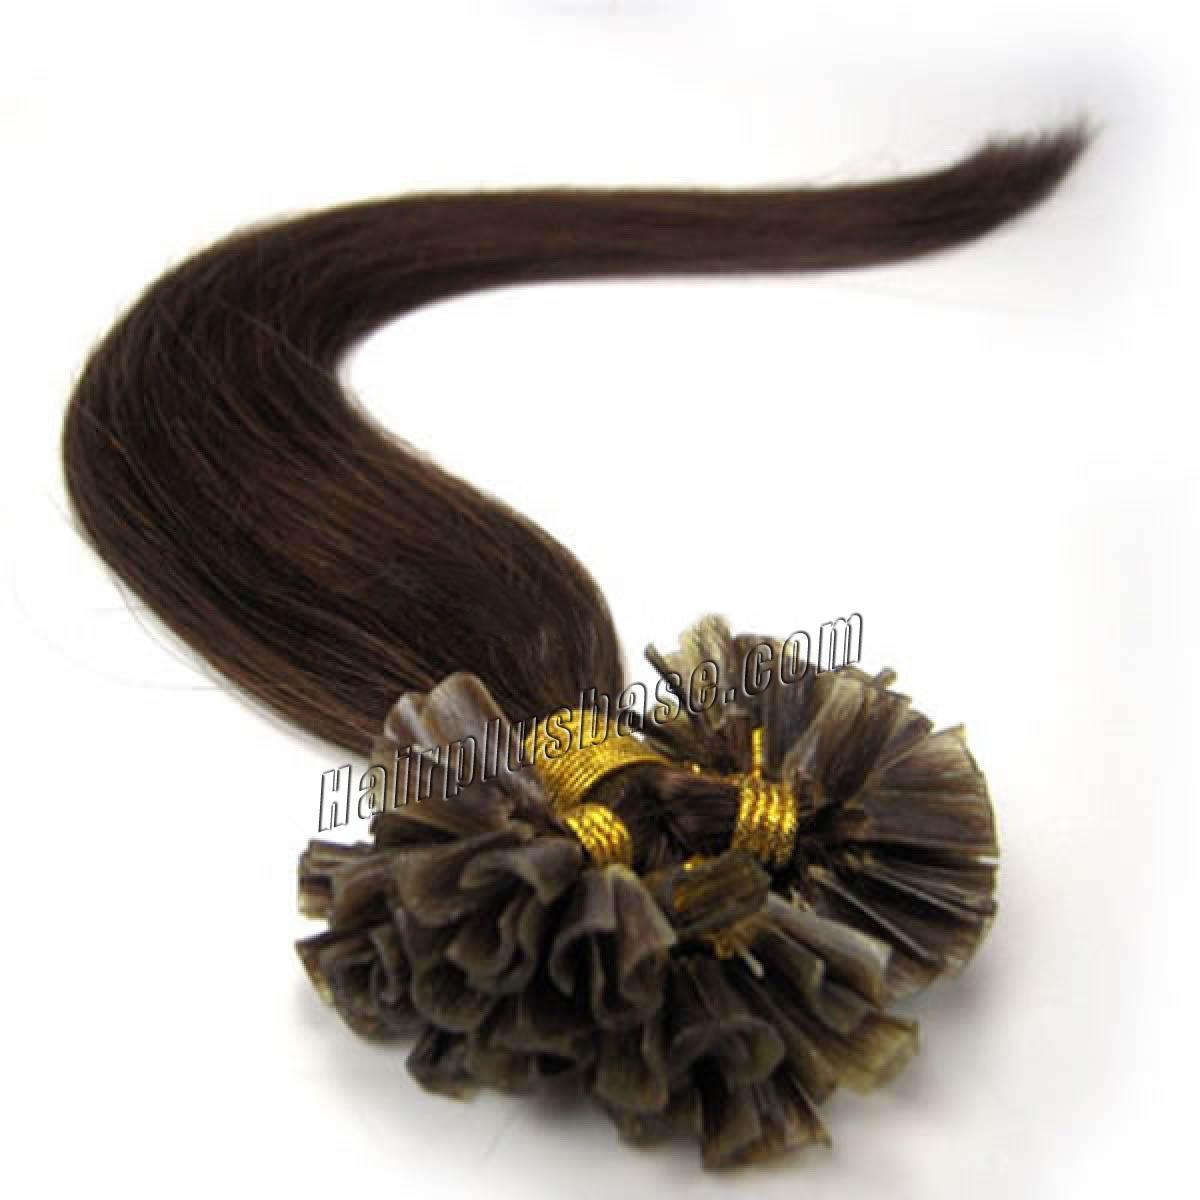 16 Inch 4 Medium Brown Nail Tip Human Hair Extensions 100s